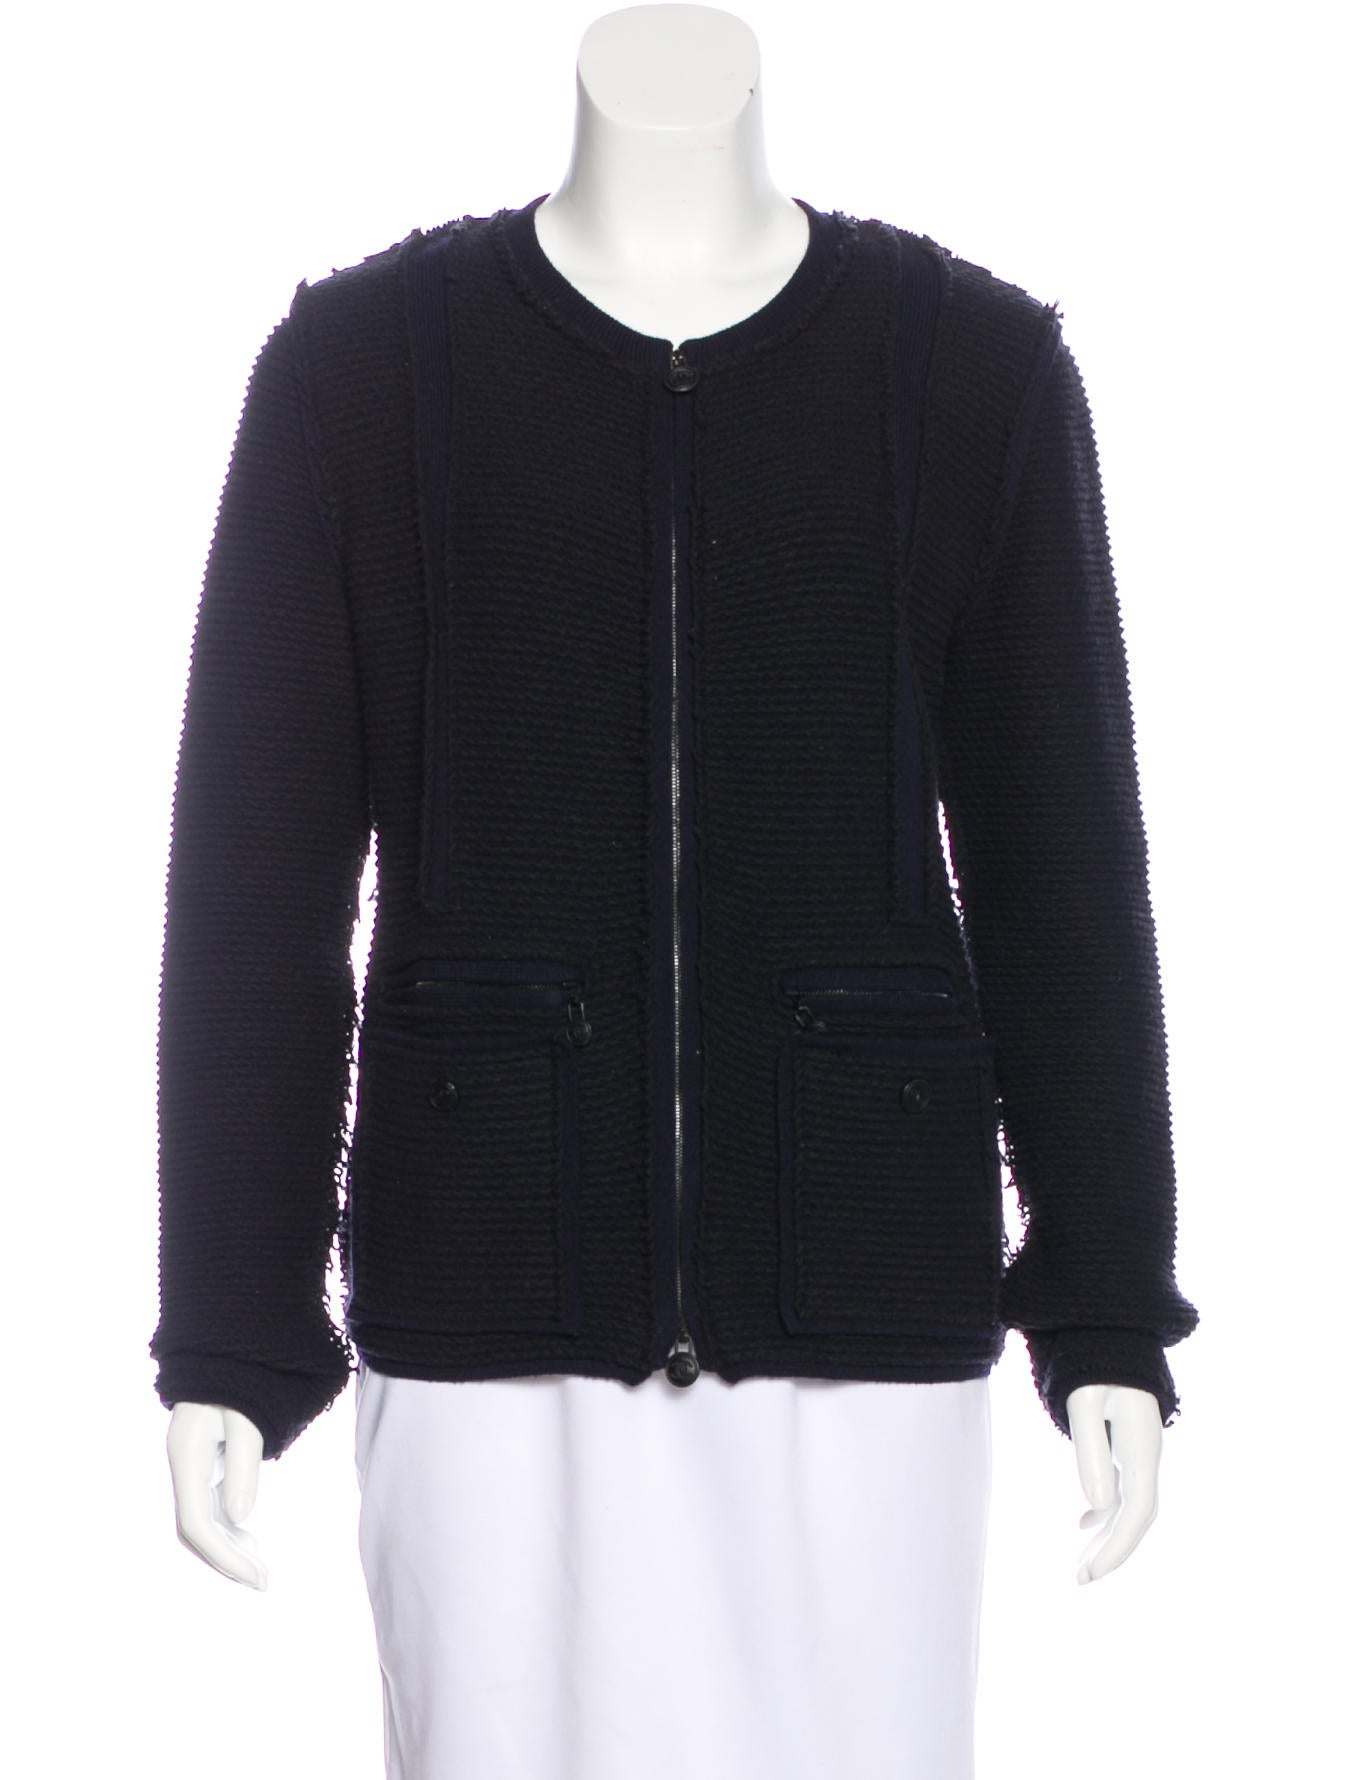 Chanel Wool Zip Cardigan - Clothing - CHA190742 | The RealReal